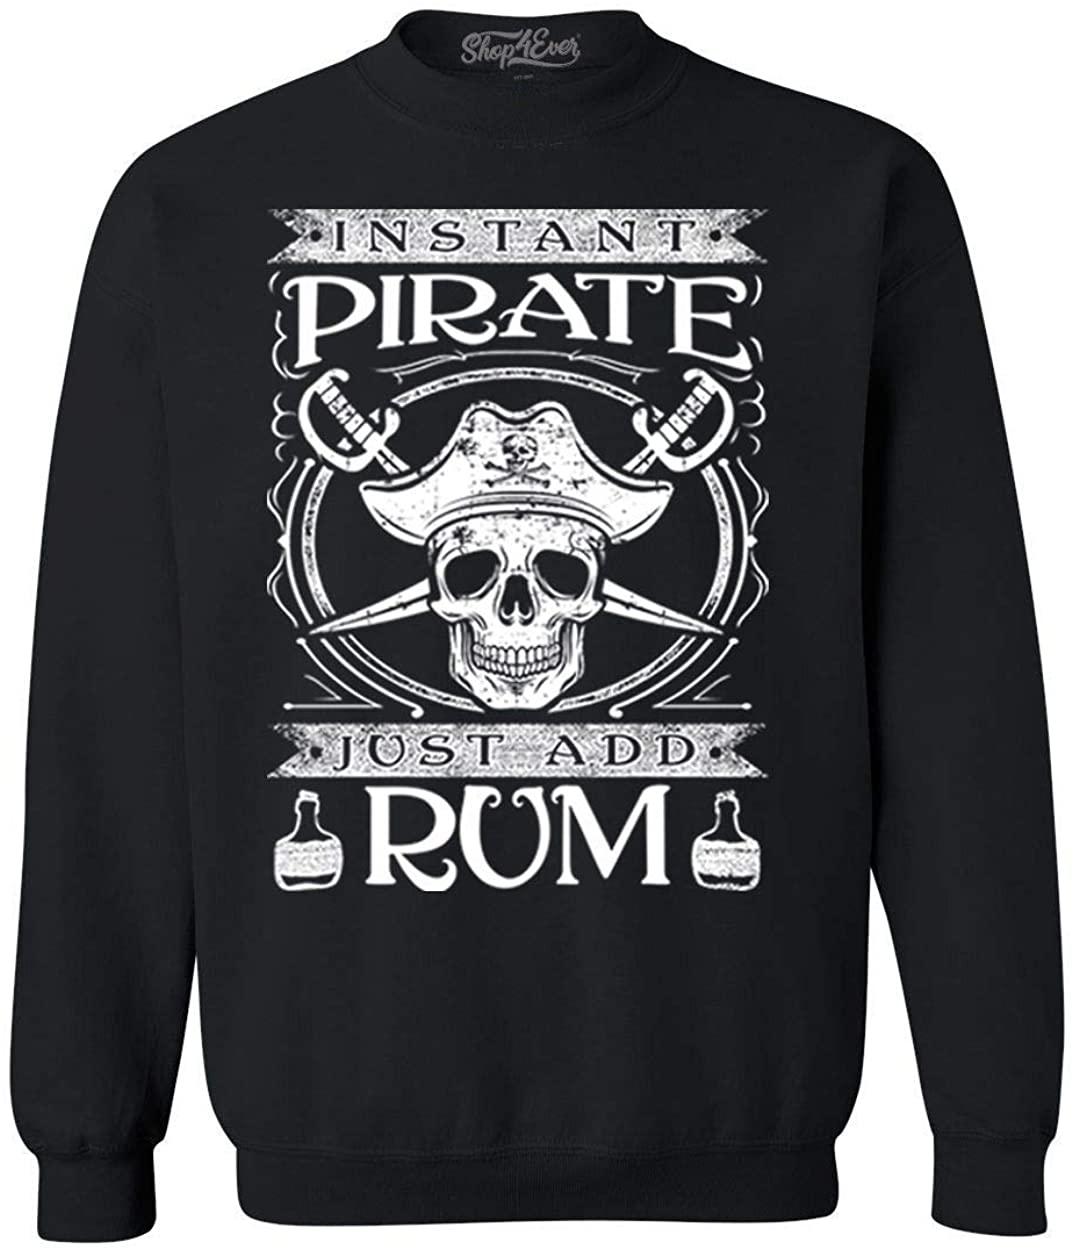 shop4ever Instant Pirate Just Add Rum Crewneck Sweatshirts